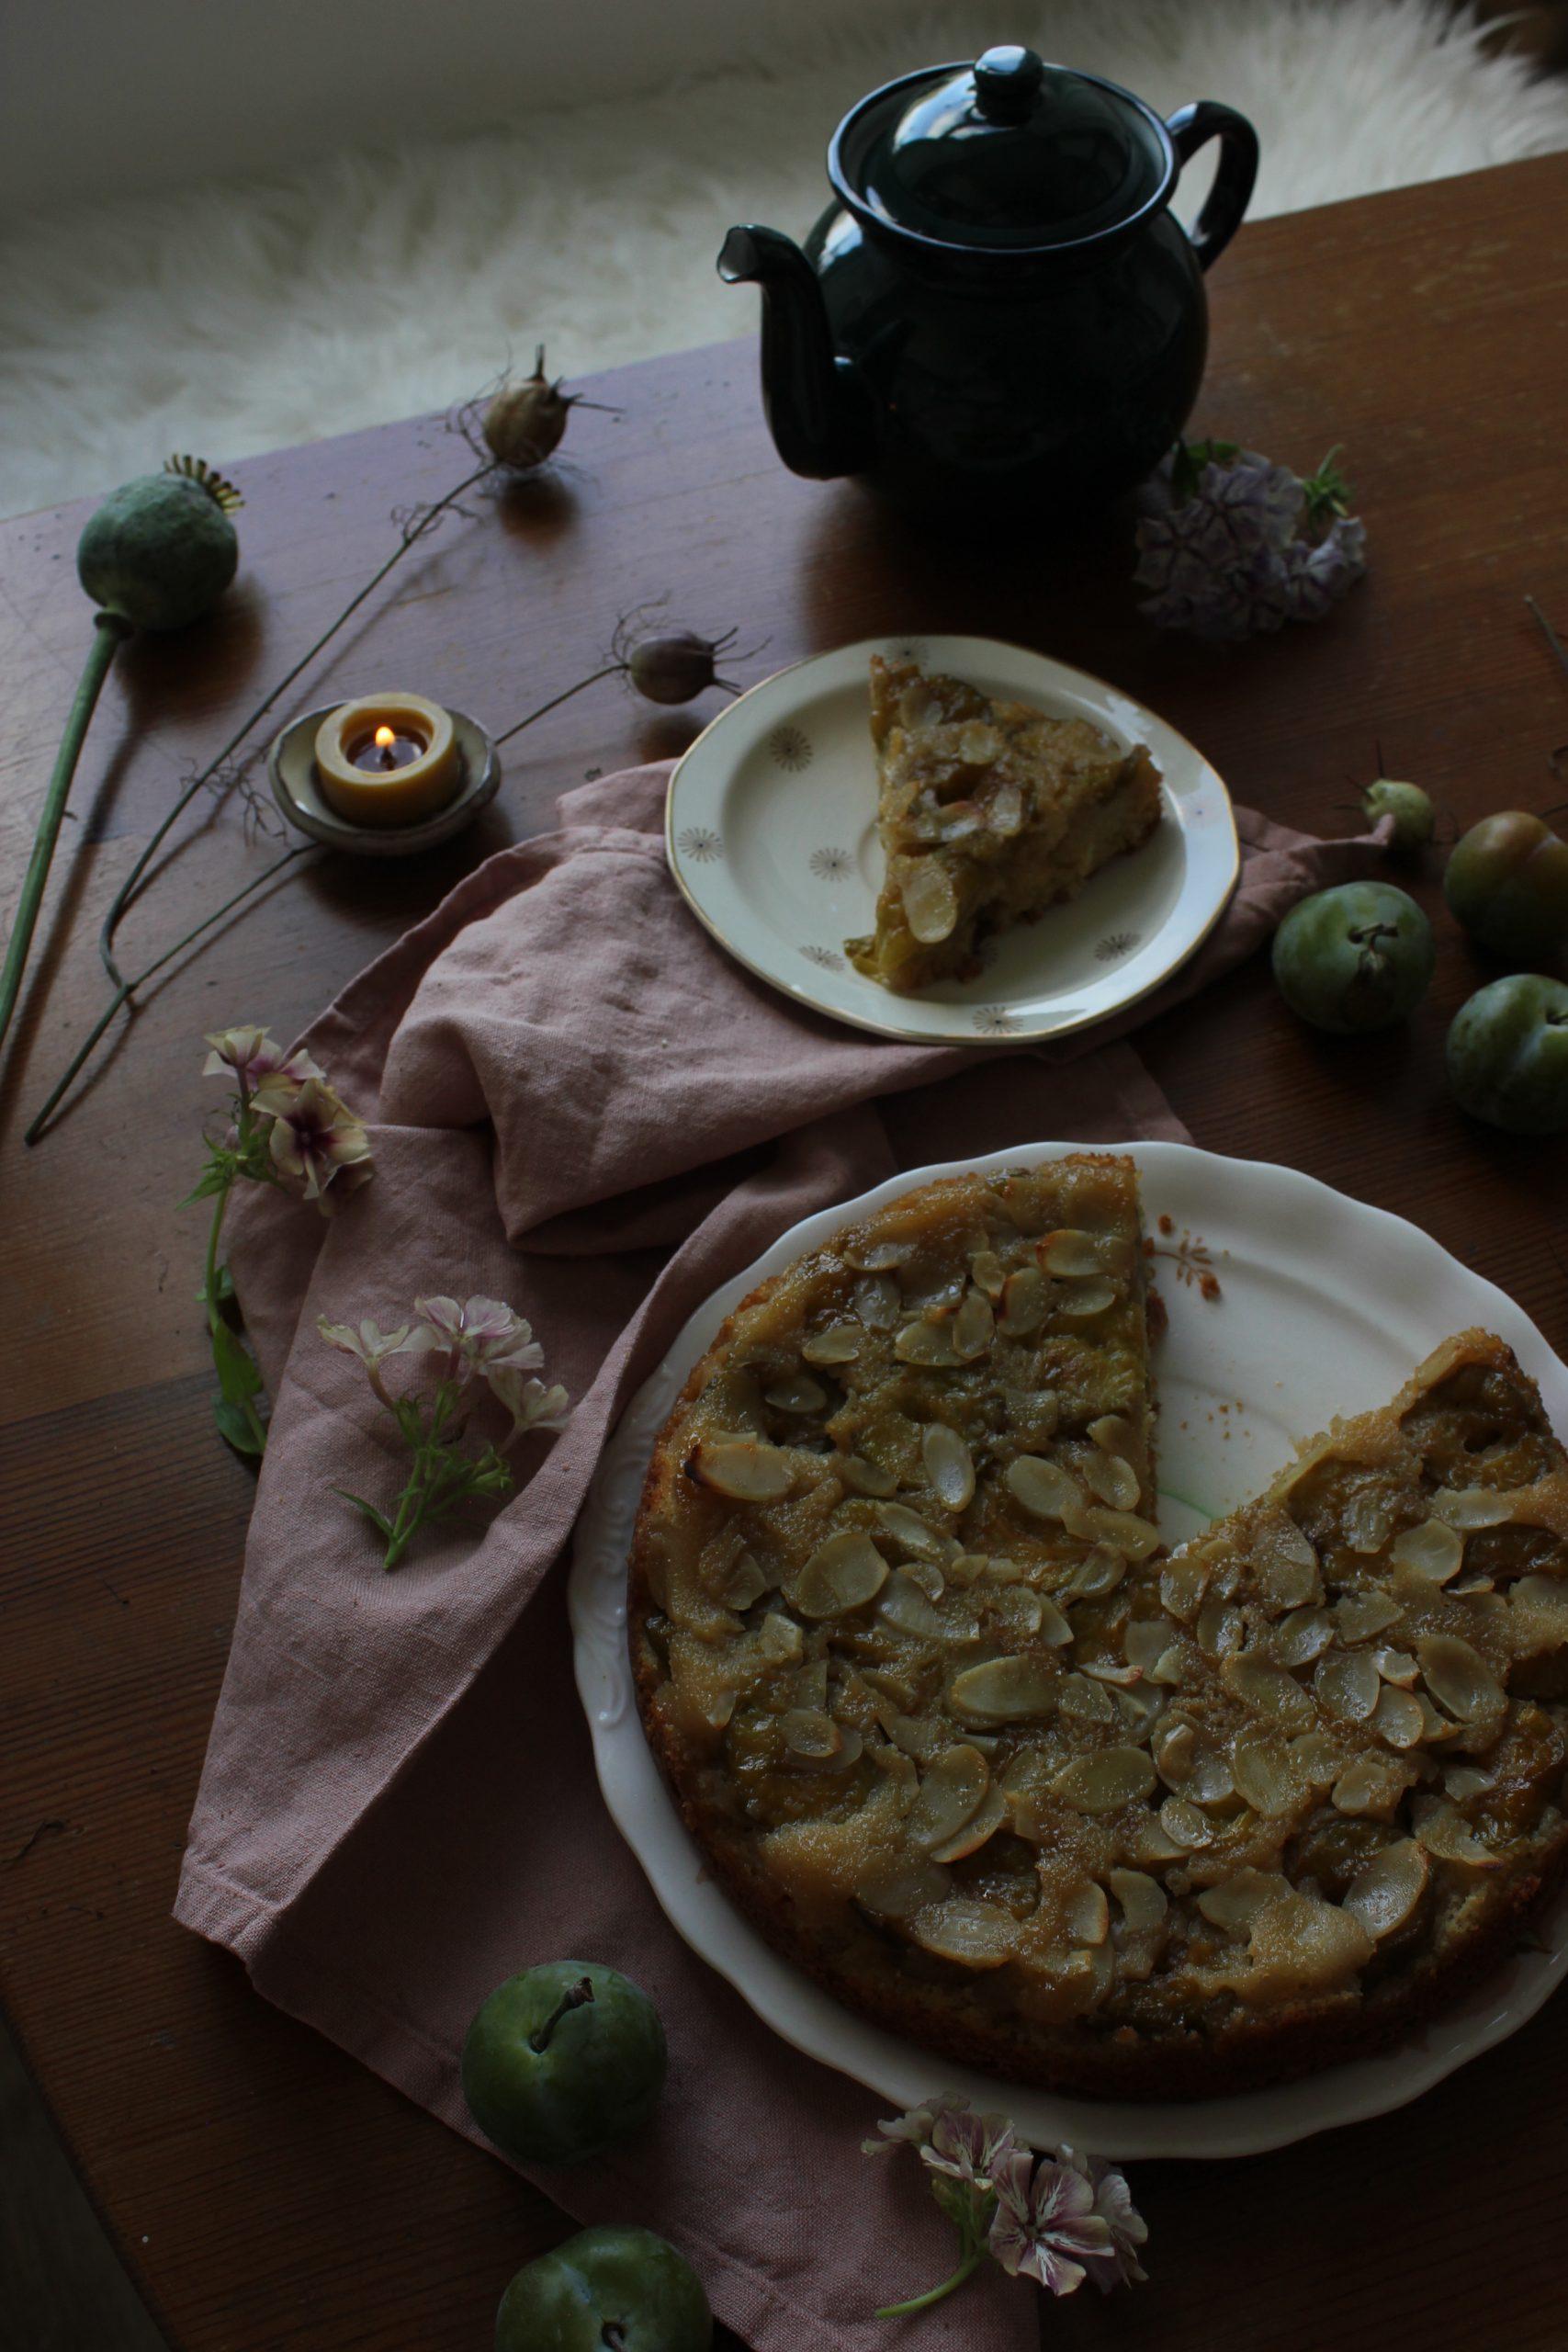 Greengage and Almond Cake